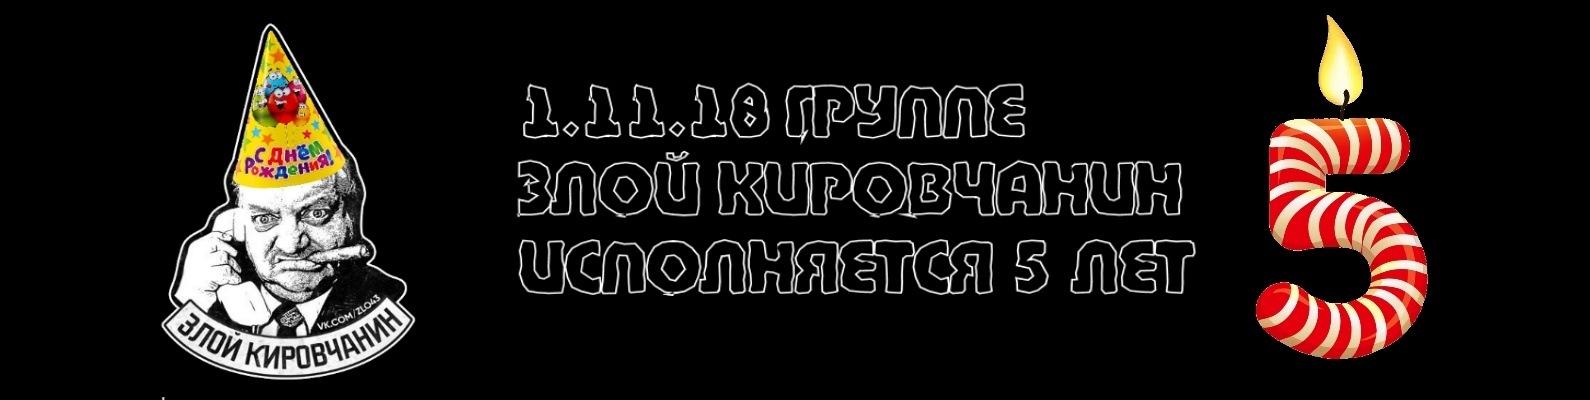 moetsya-pod-kranom-telka-porno-volosatie-latini